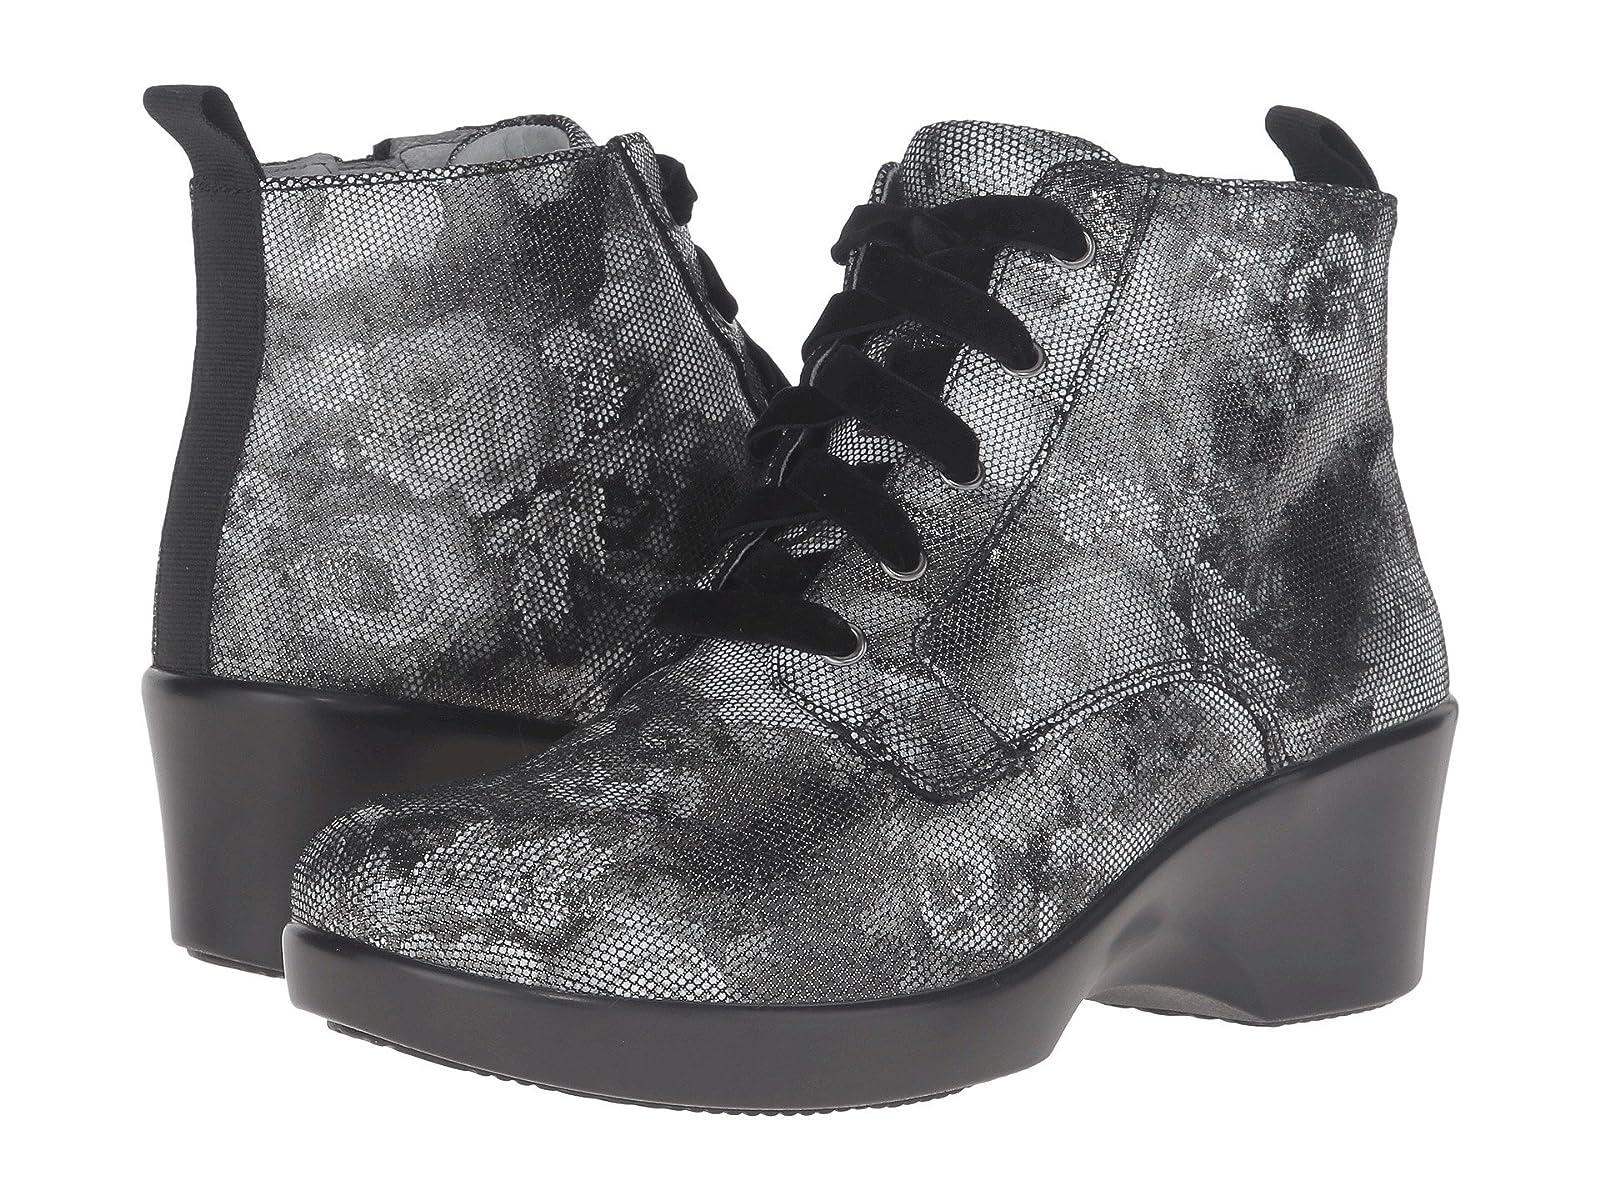 Alegria ElizaCheap and distinctive eye-catching shoes